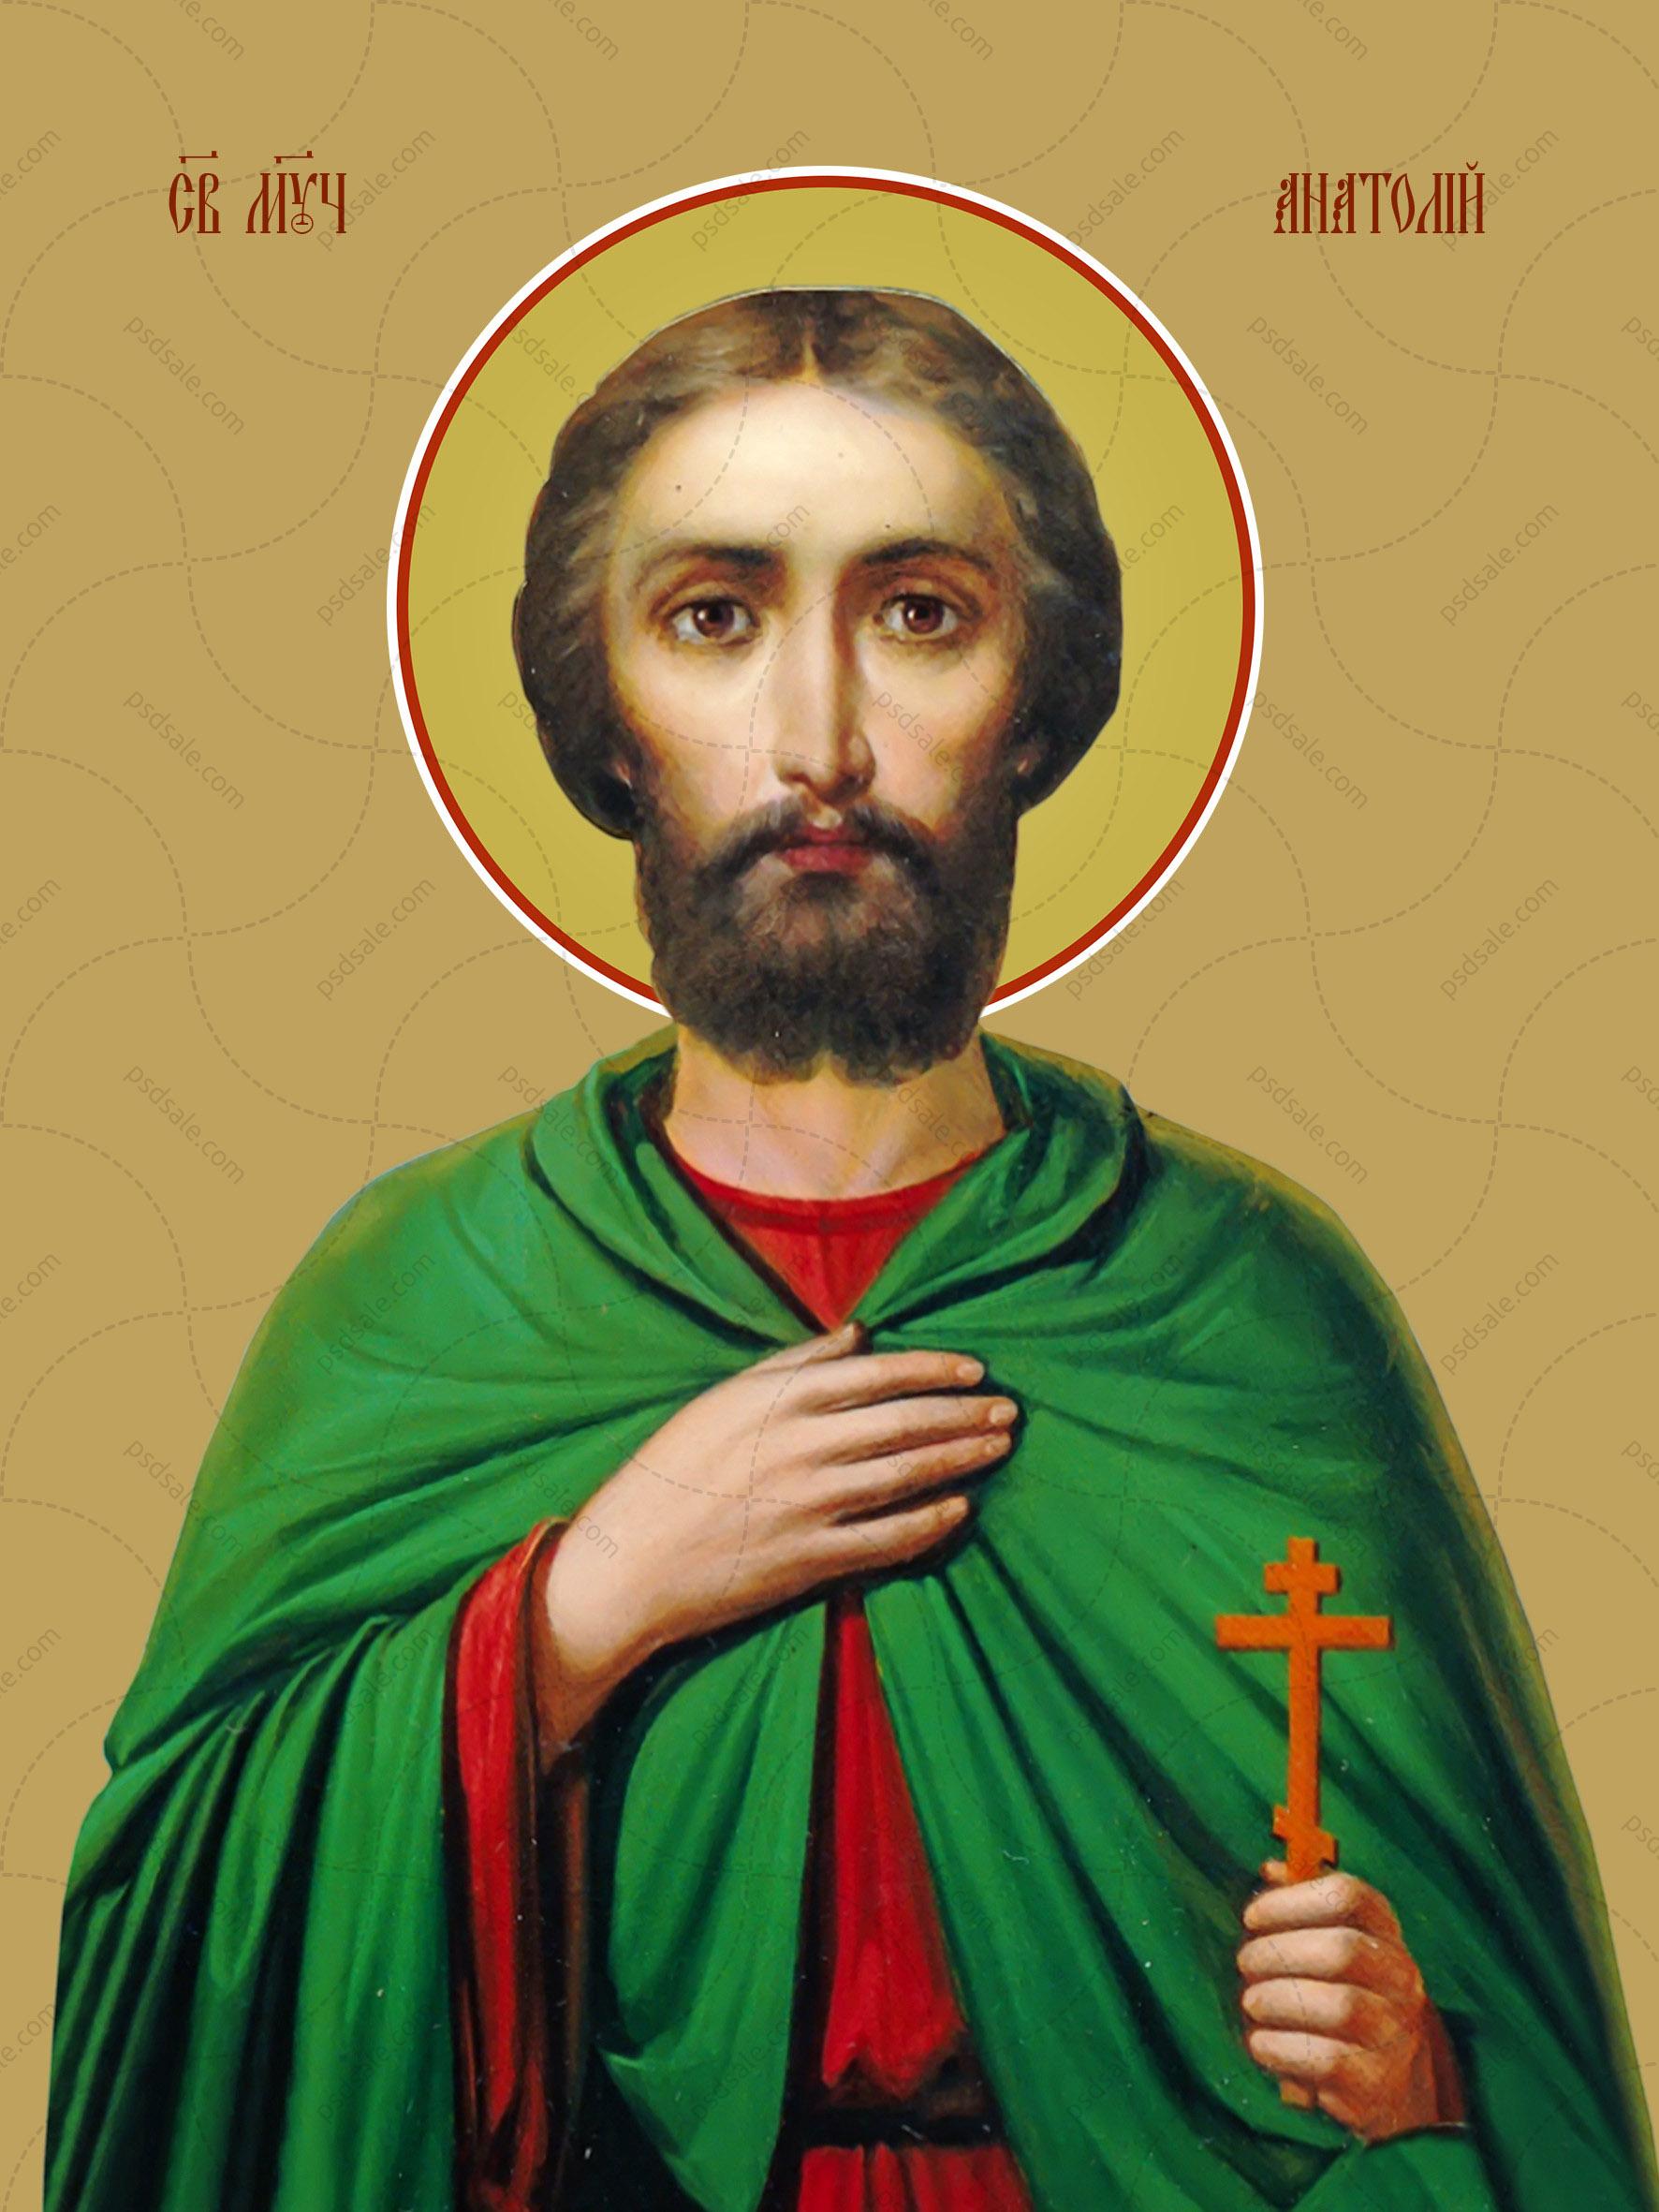 Анатолий, мученик